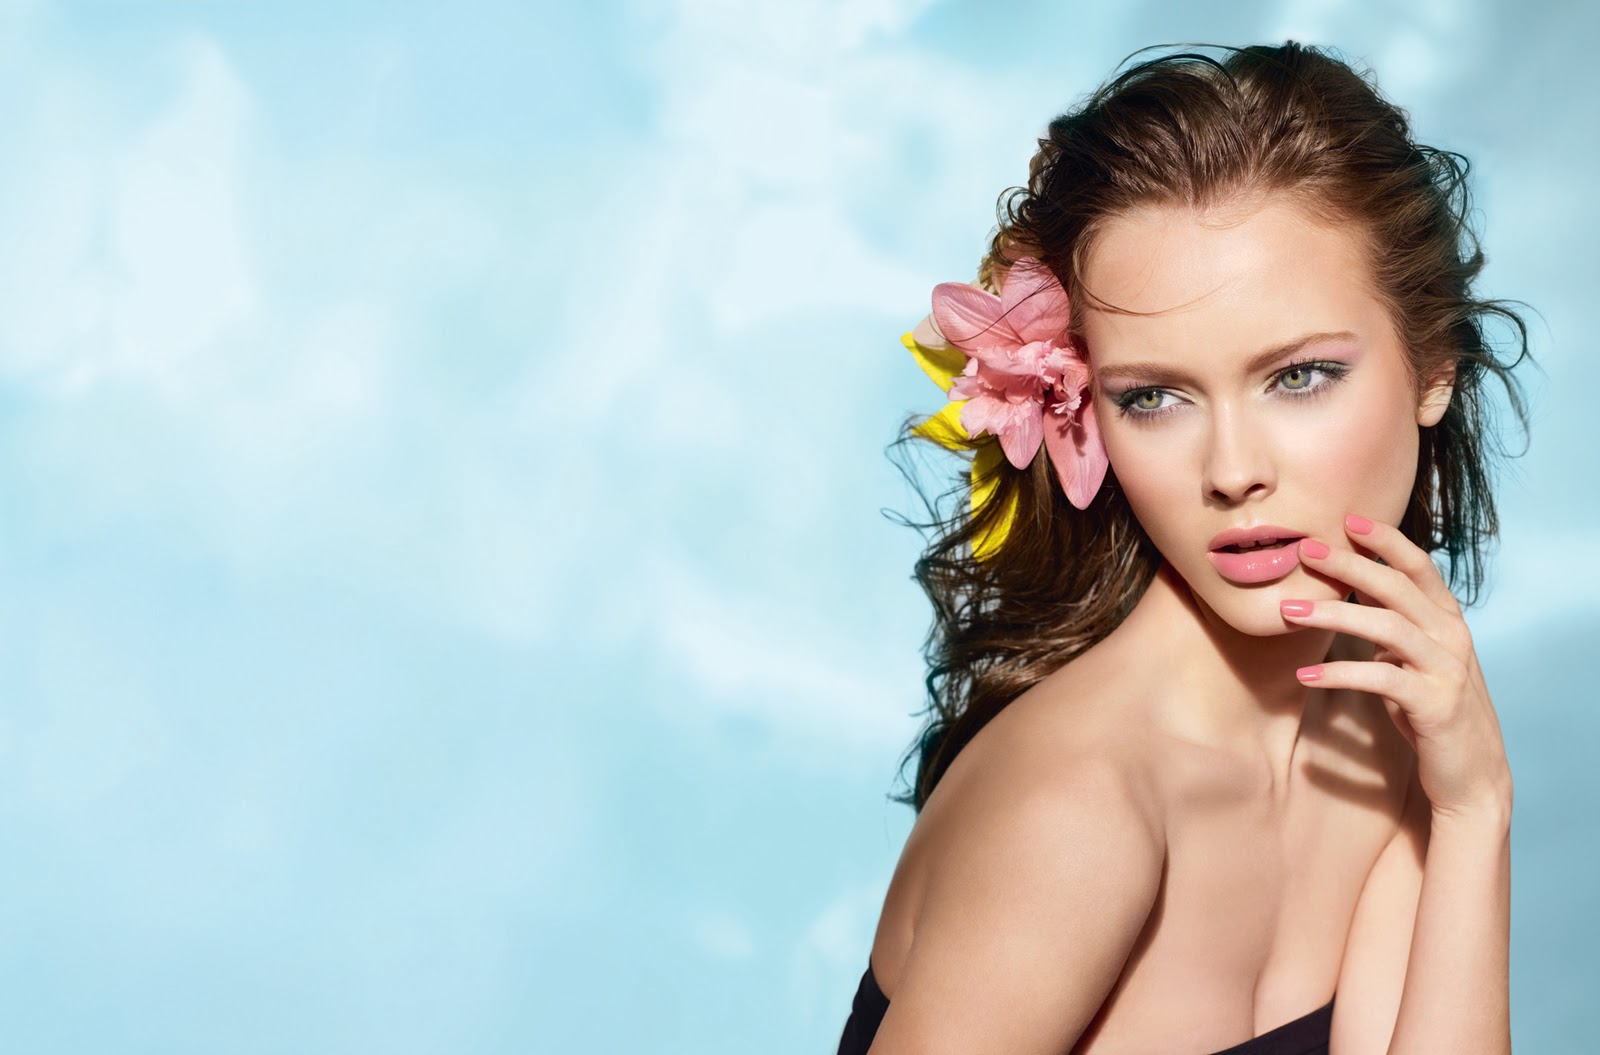 monika jac jagaciak, a polish model. promo image - fb spin